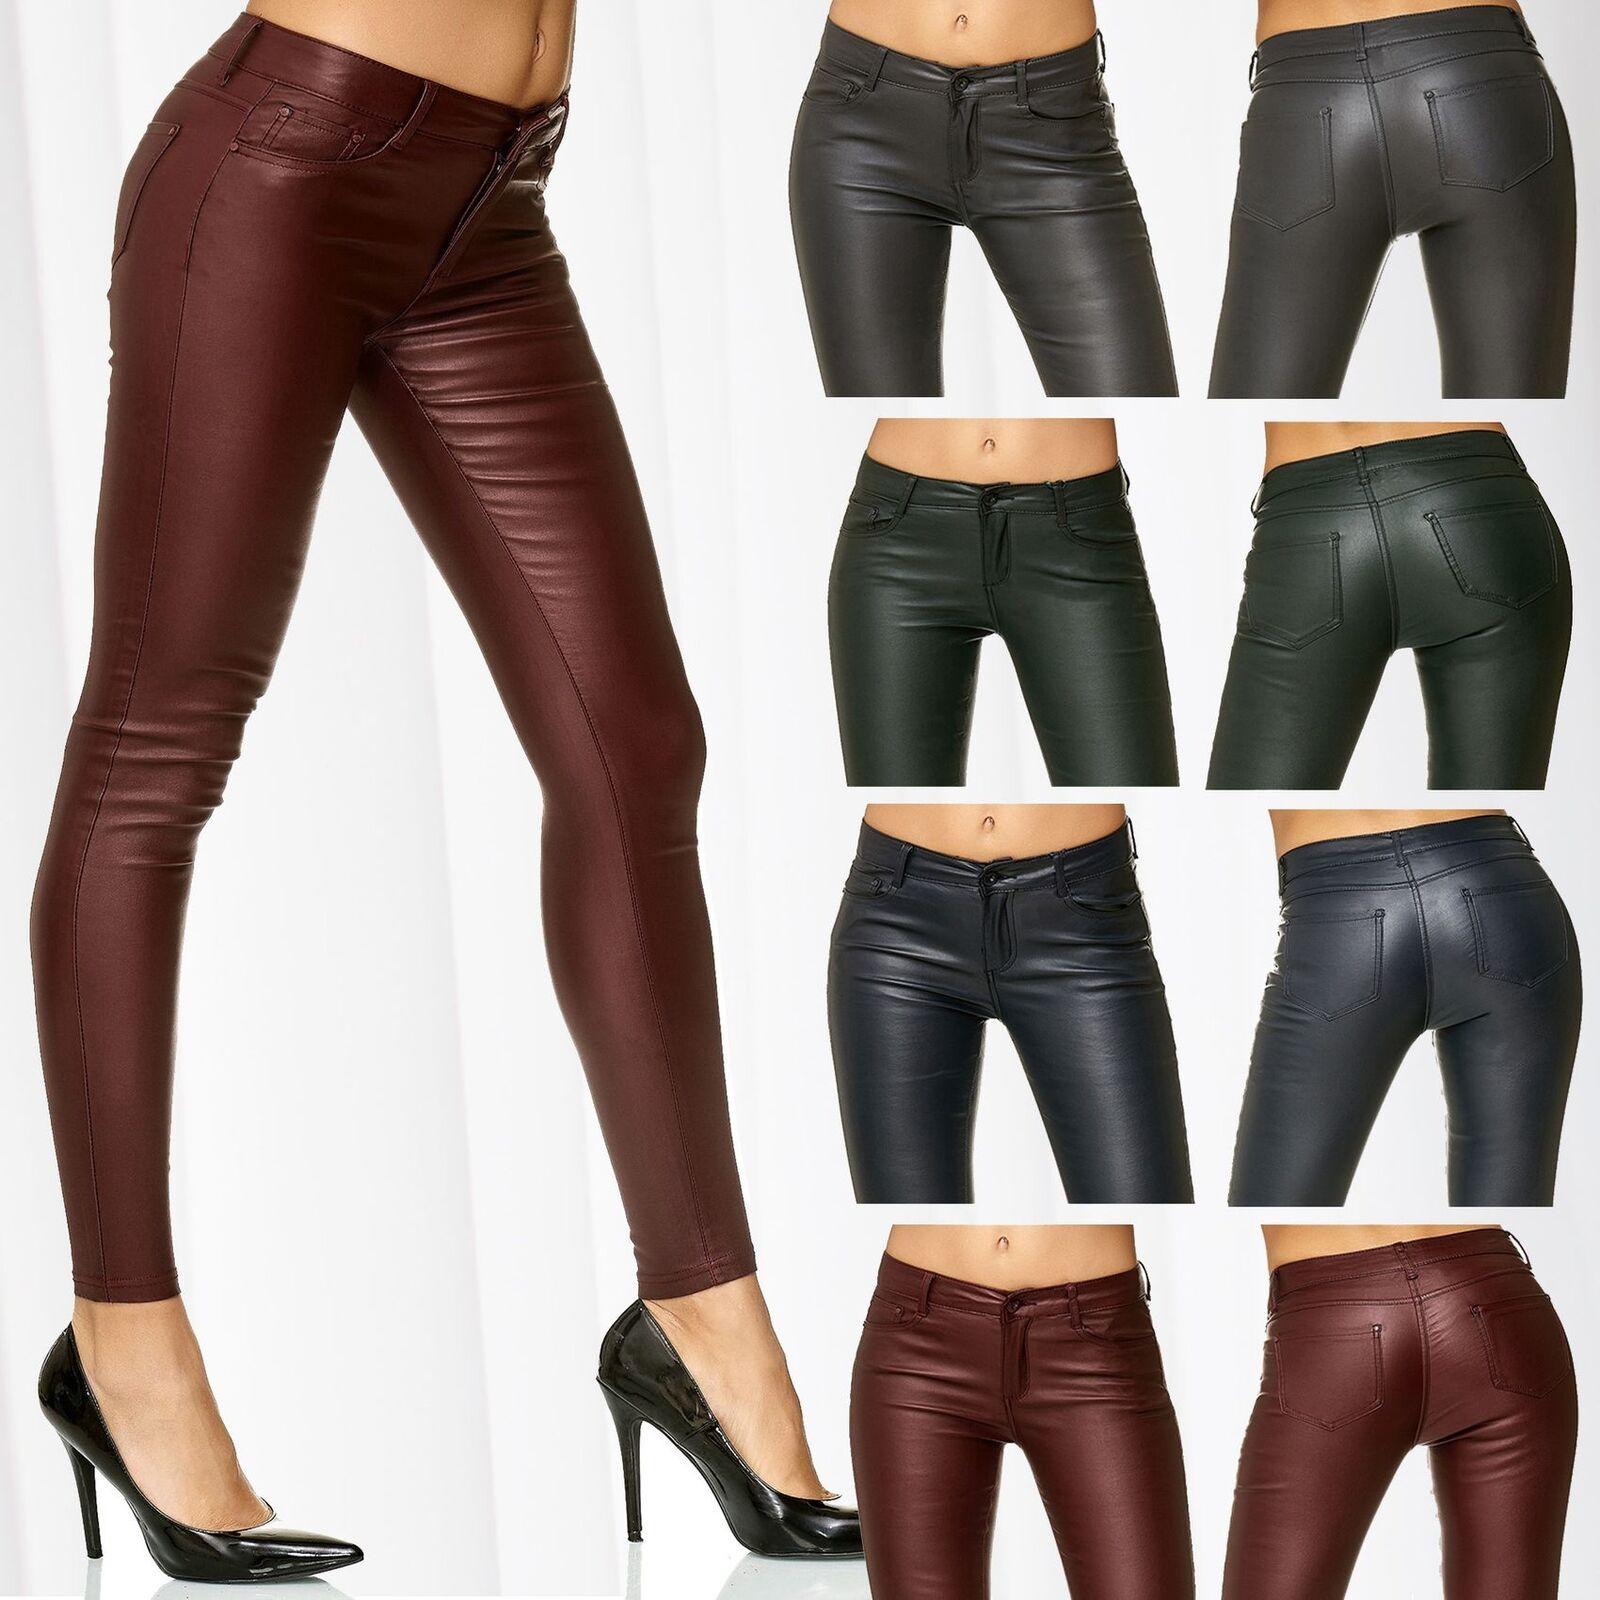 ZOGAA Women PU Leather Pants Ladies Sexy Skinny PU Tight Trousers Female Solid Slim Biker Art Leather Pencil Pants 2019 New